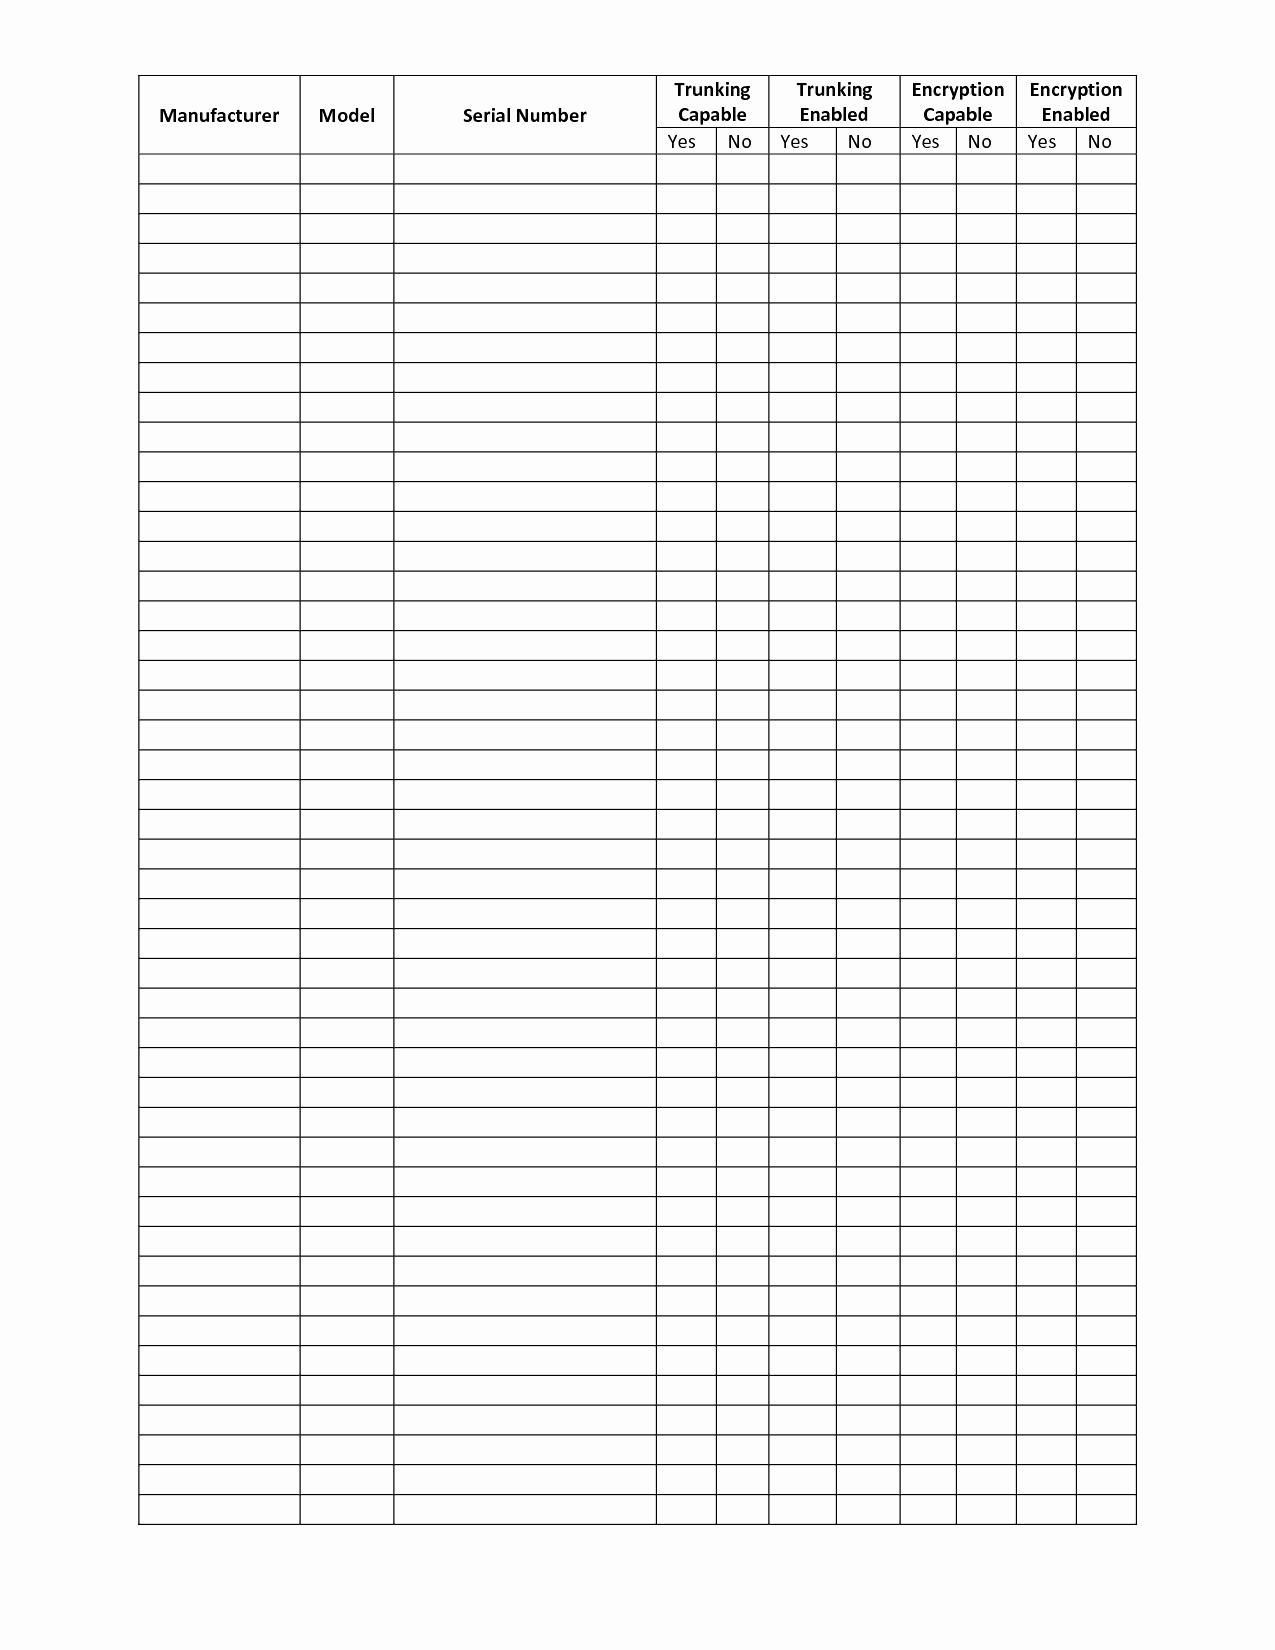 Cattle Inventory Spreadsheet Template Fresh Free Inventory Tracking Throughout Cattle Inventory Spreadsheet